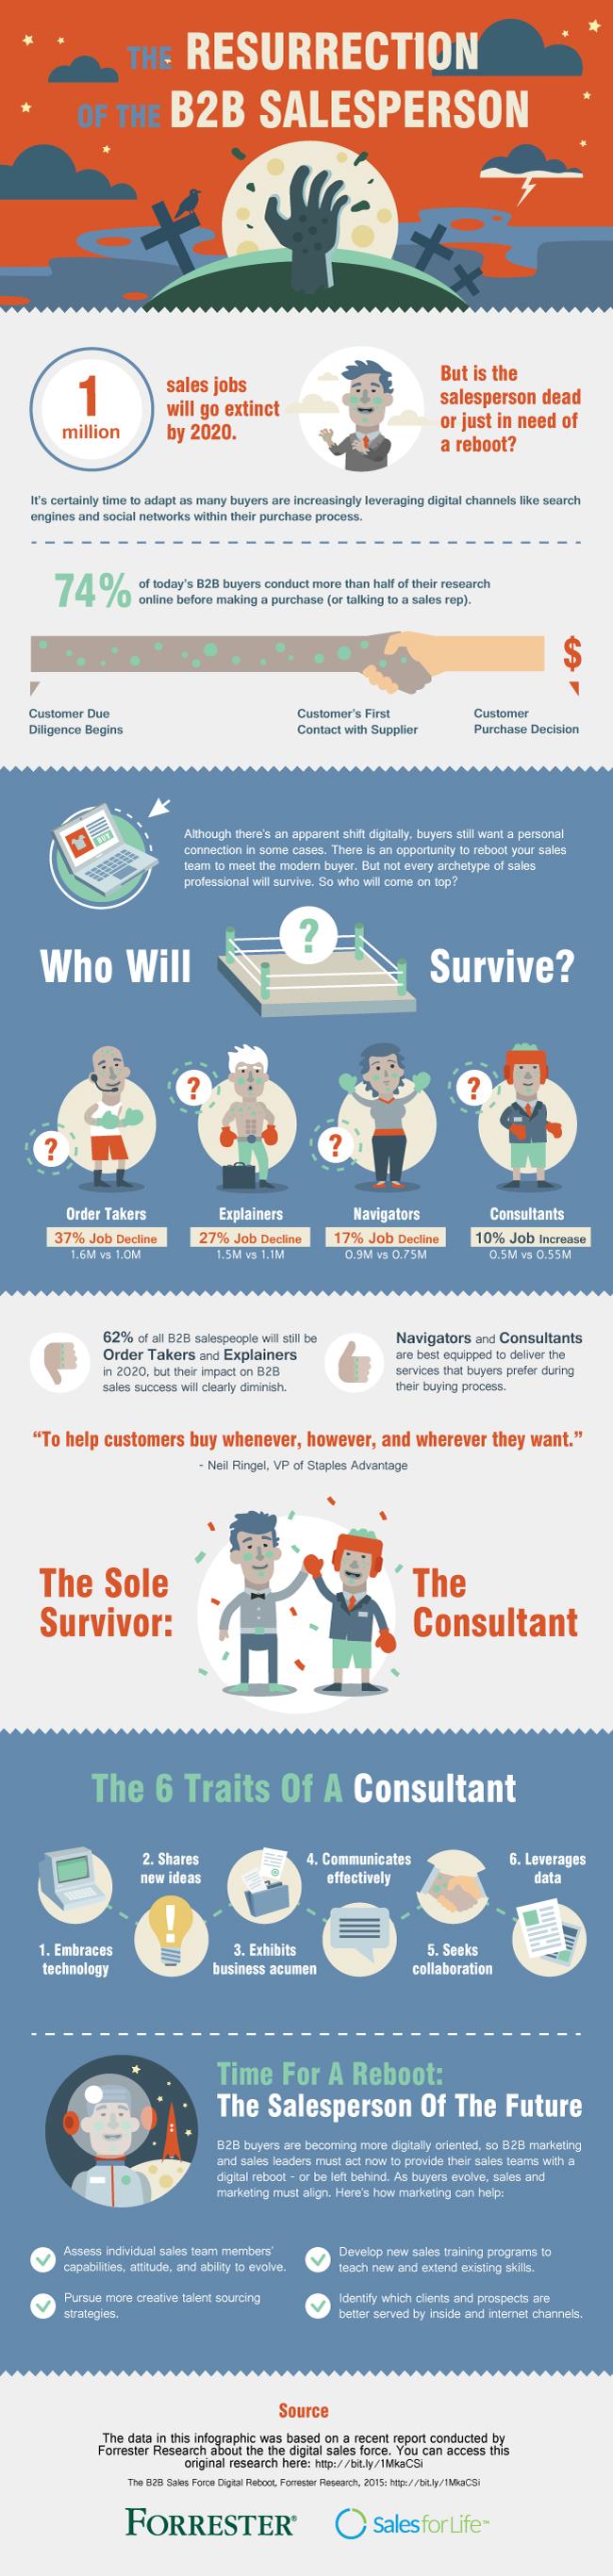 Infographic: The resurrection of the B2B salesman